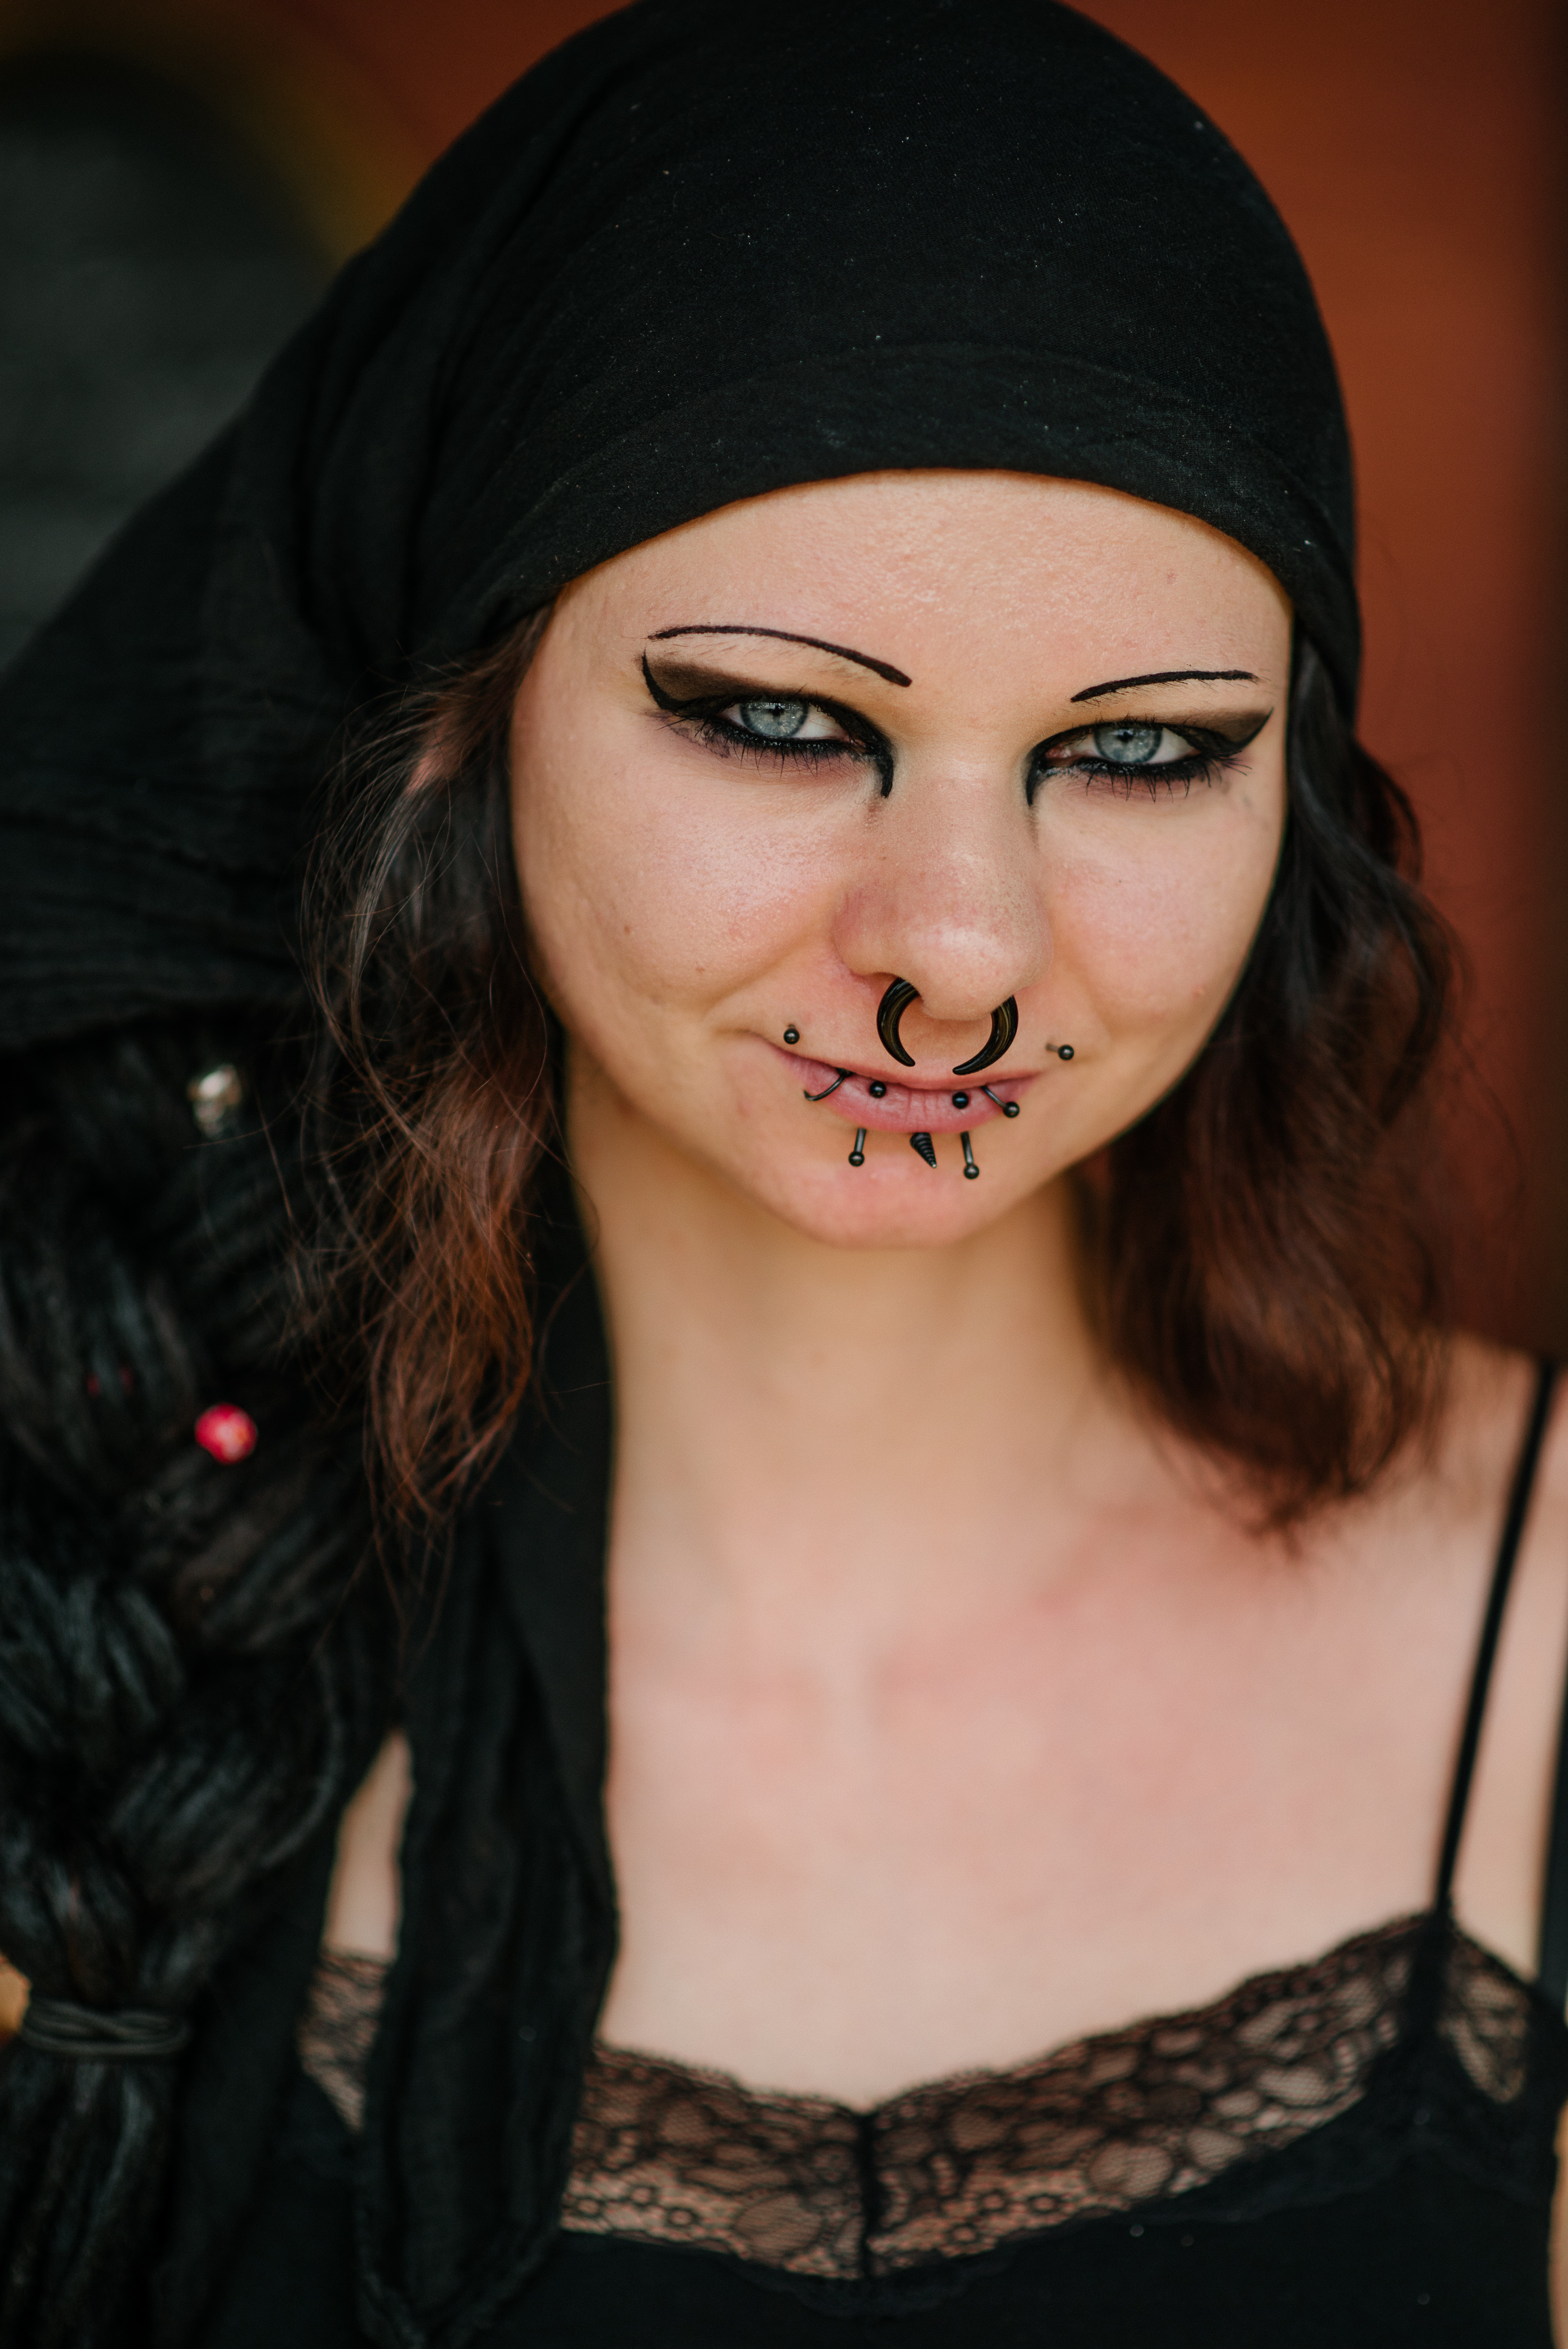 ML_16_Faces of Mera Luna_Robin_Schmiedebach_115725.jpg